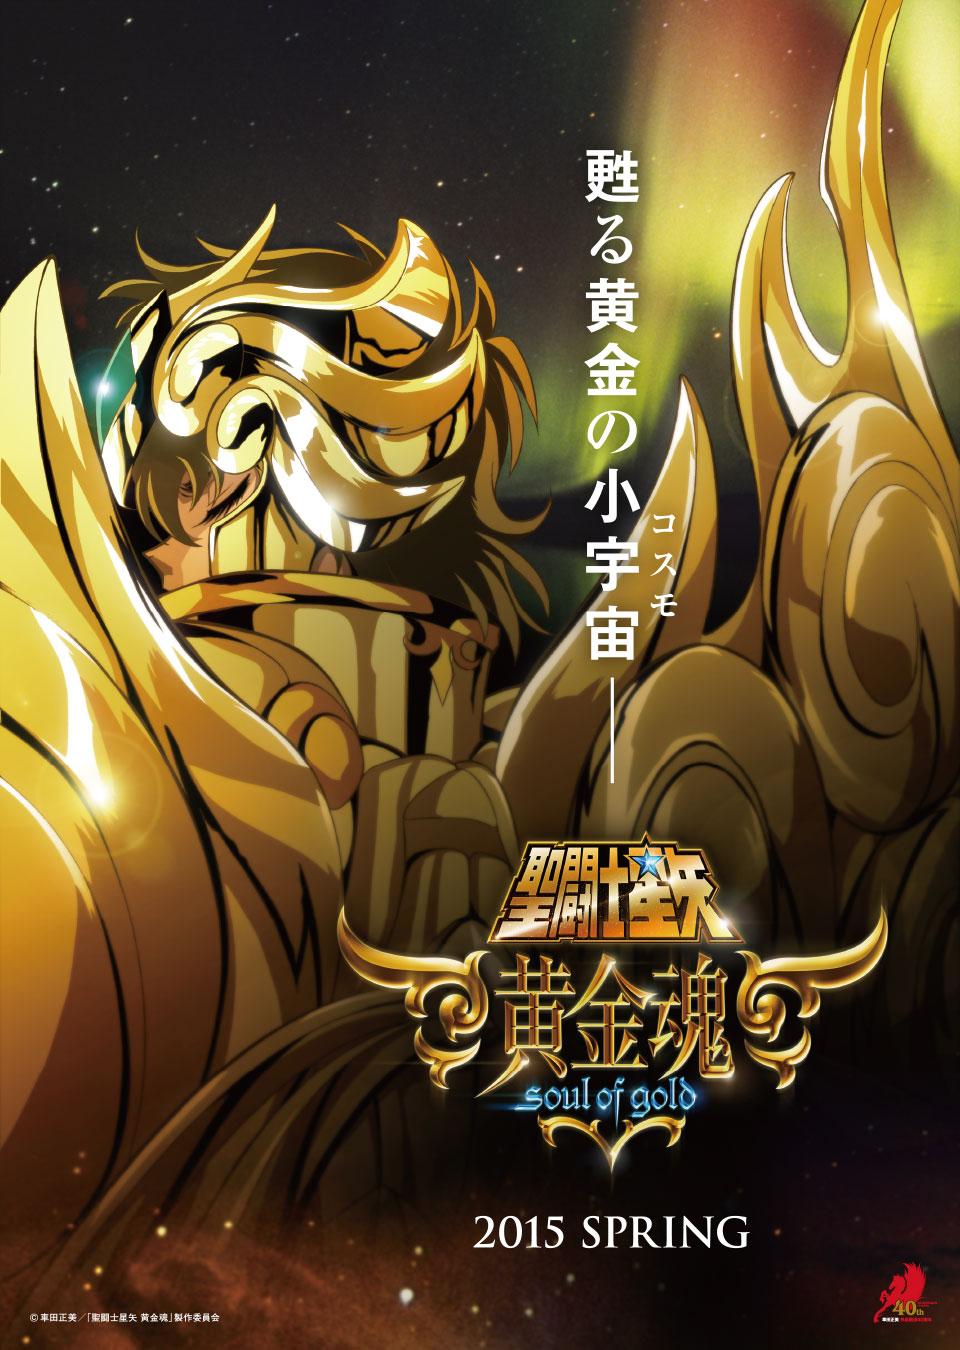 Saint Seiya Soul of god 2